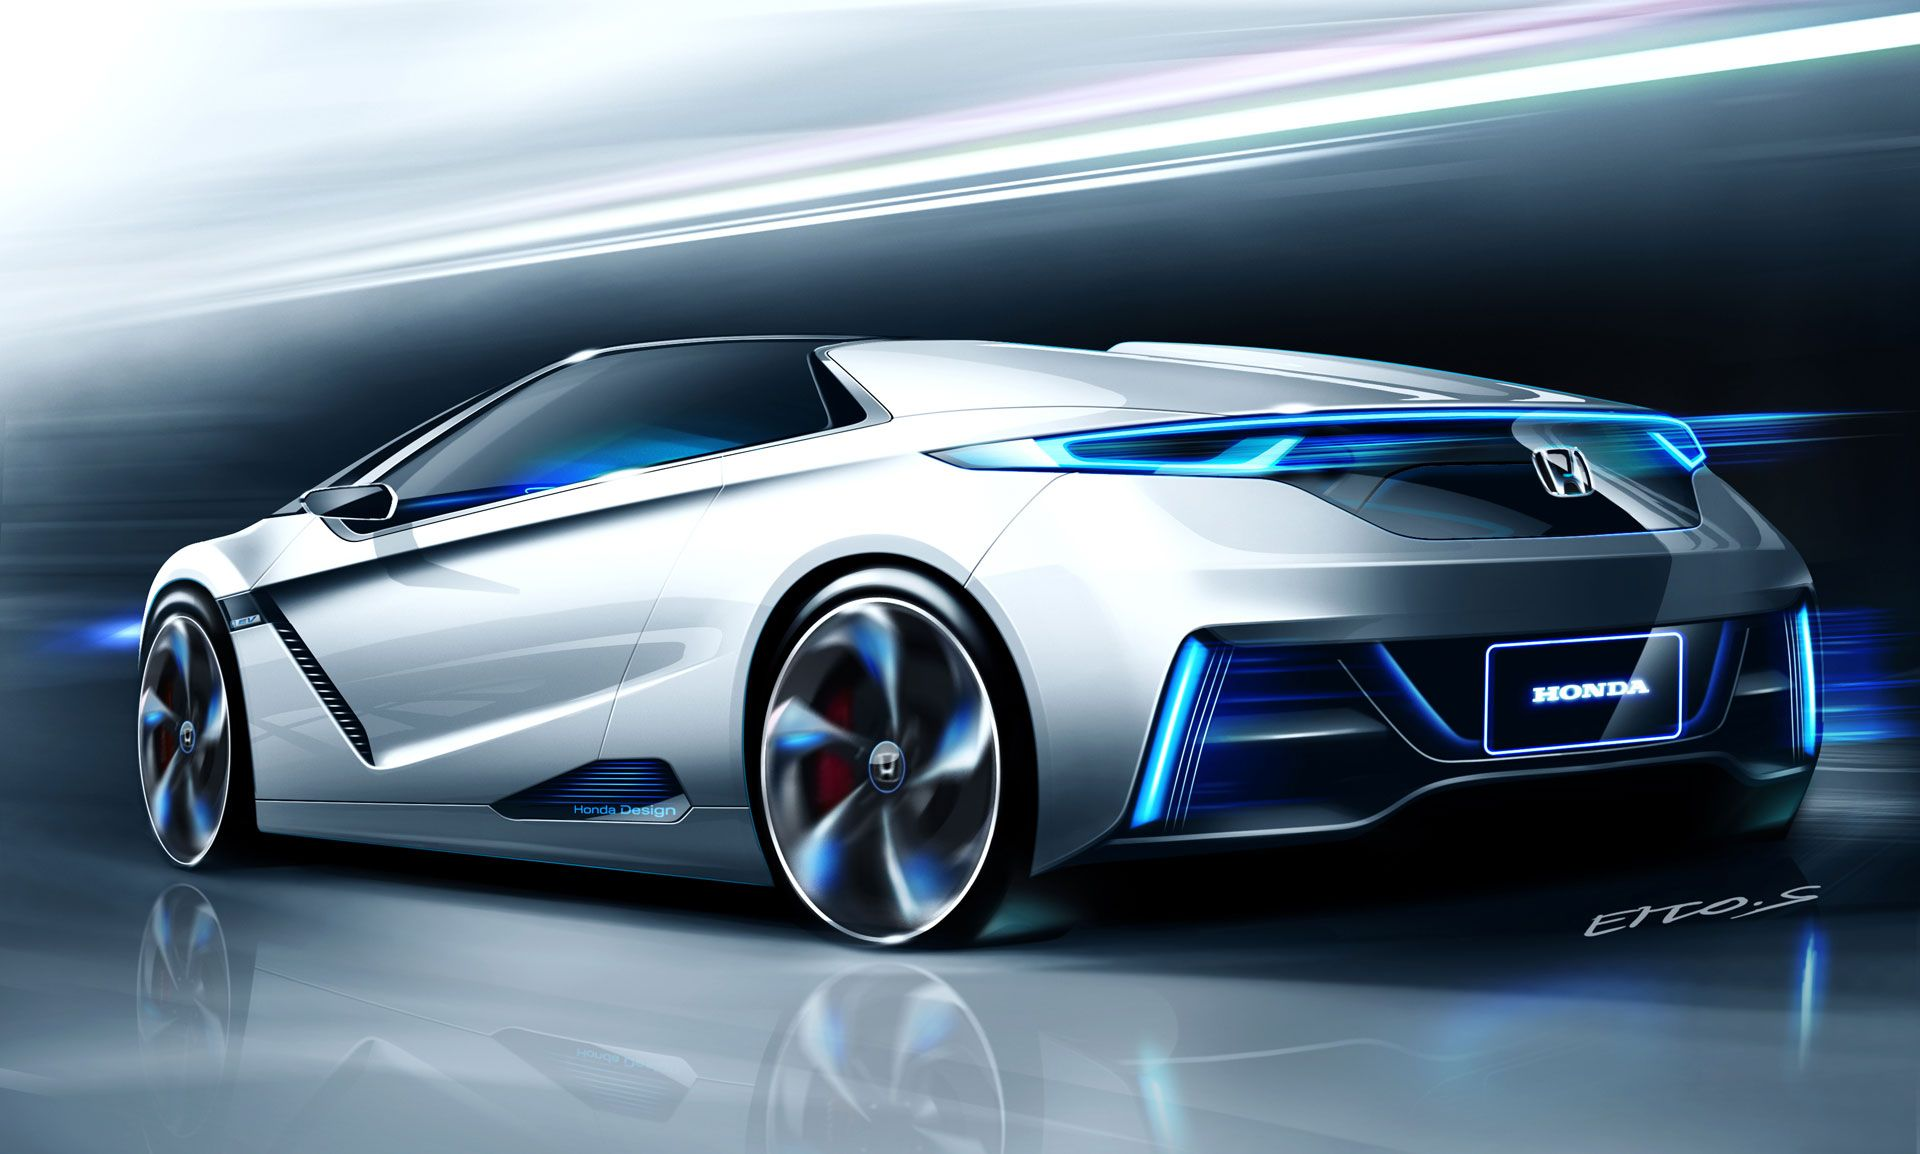 Honda Ev Ster Concept Design Sketch Car Body Design With Images